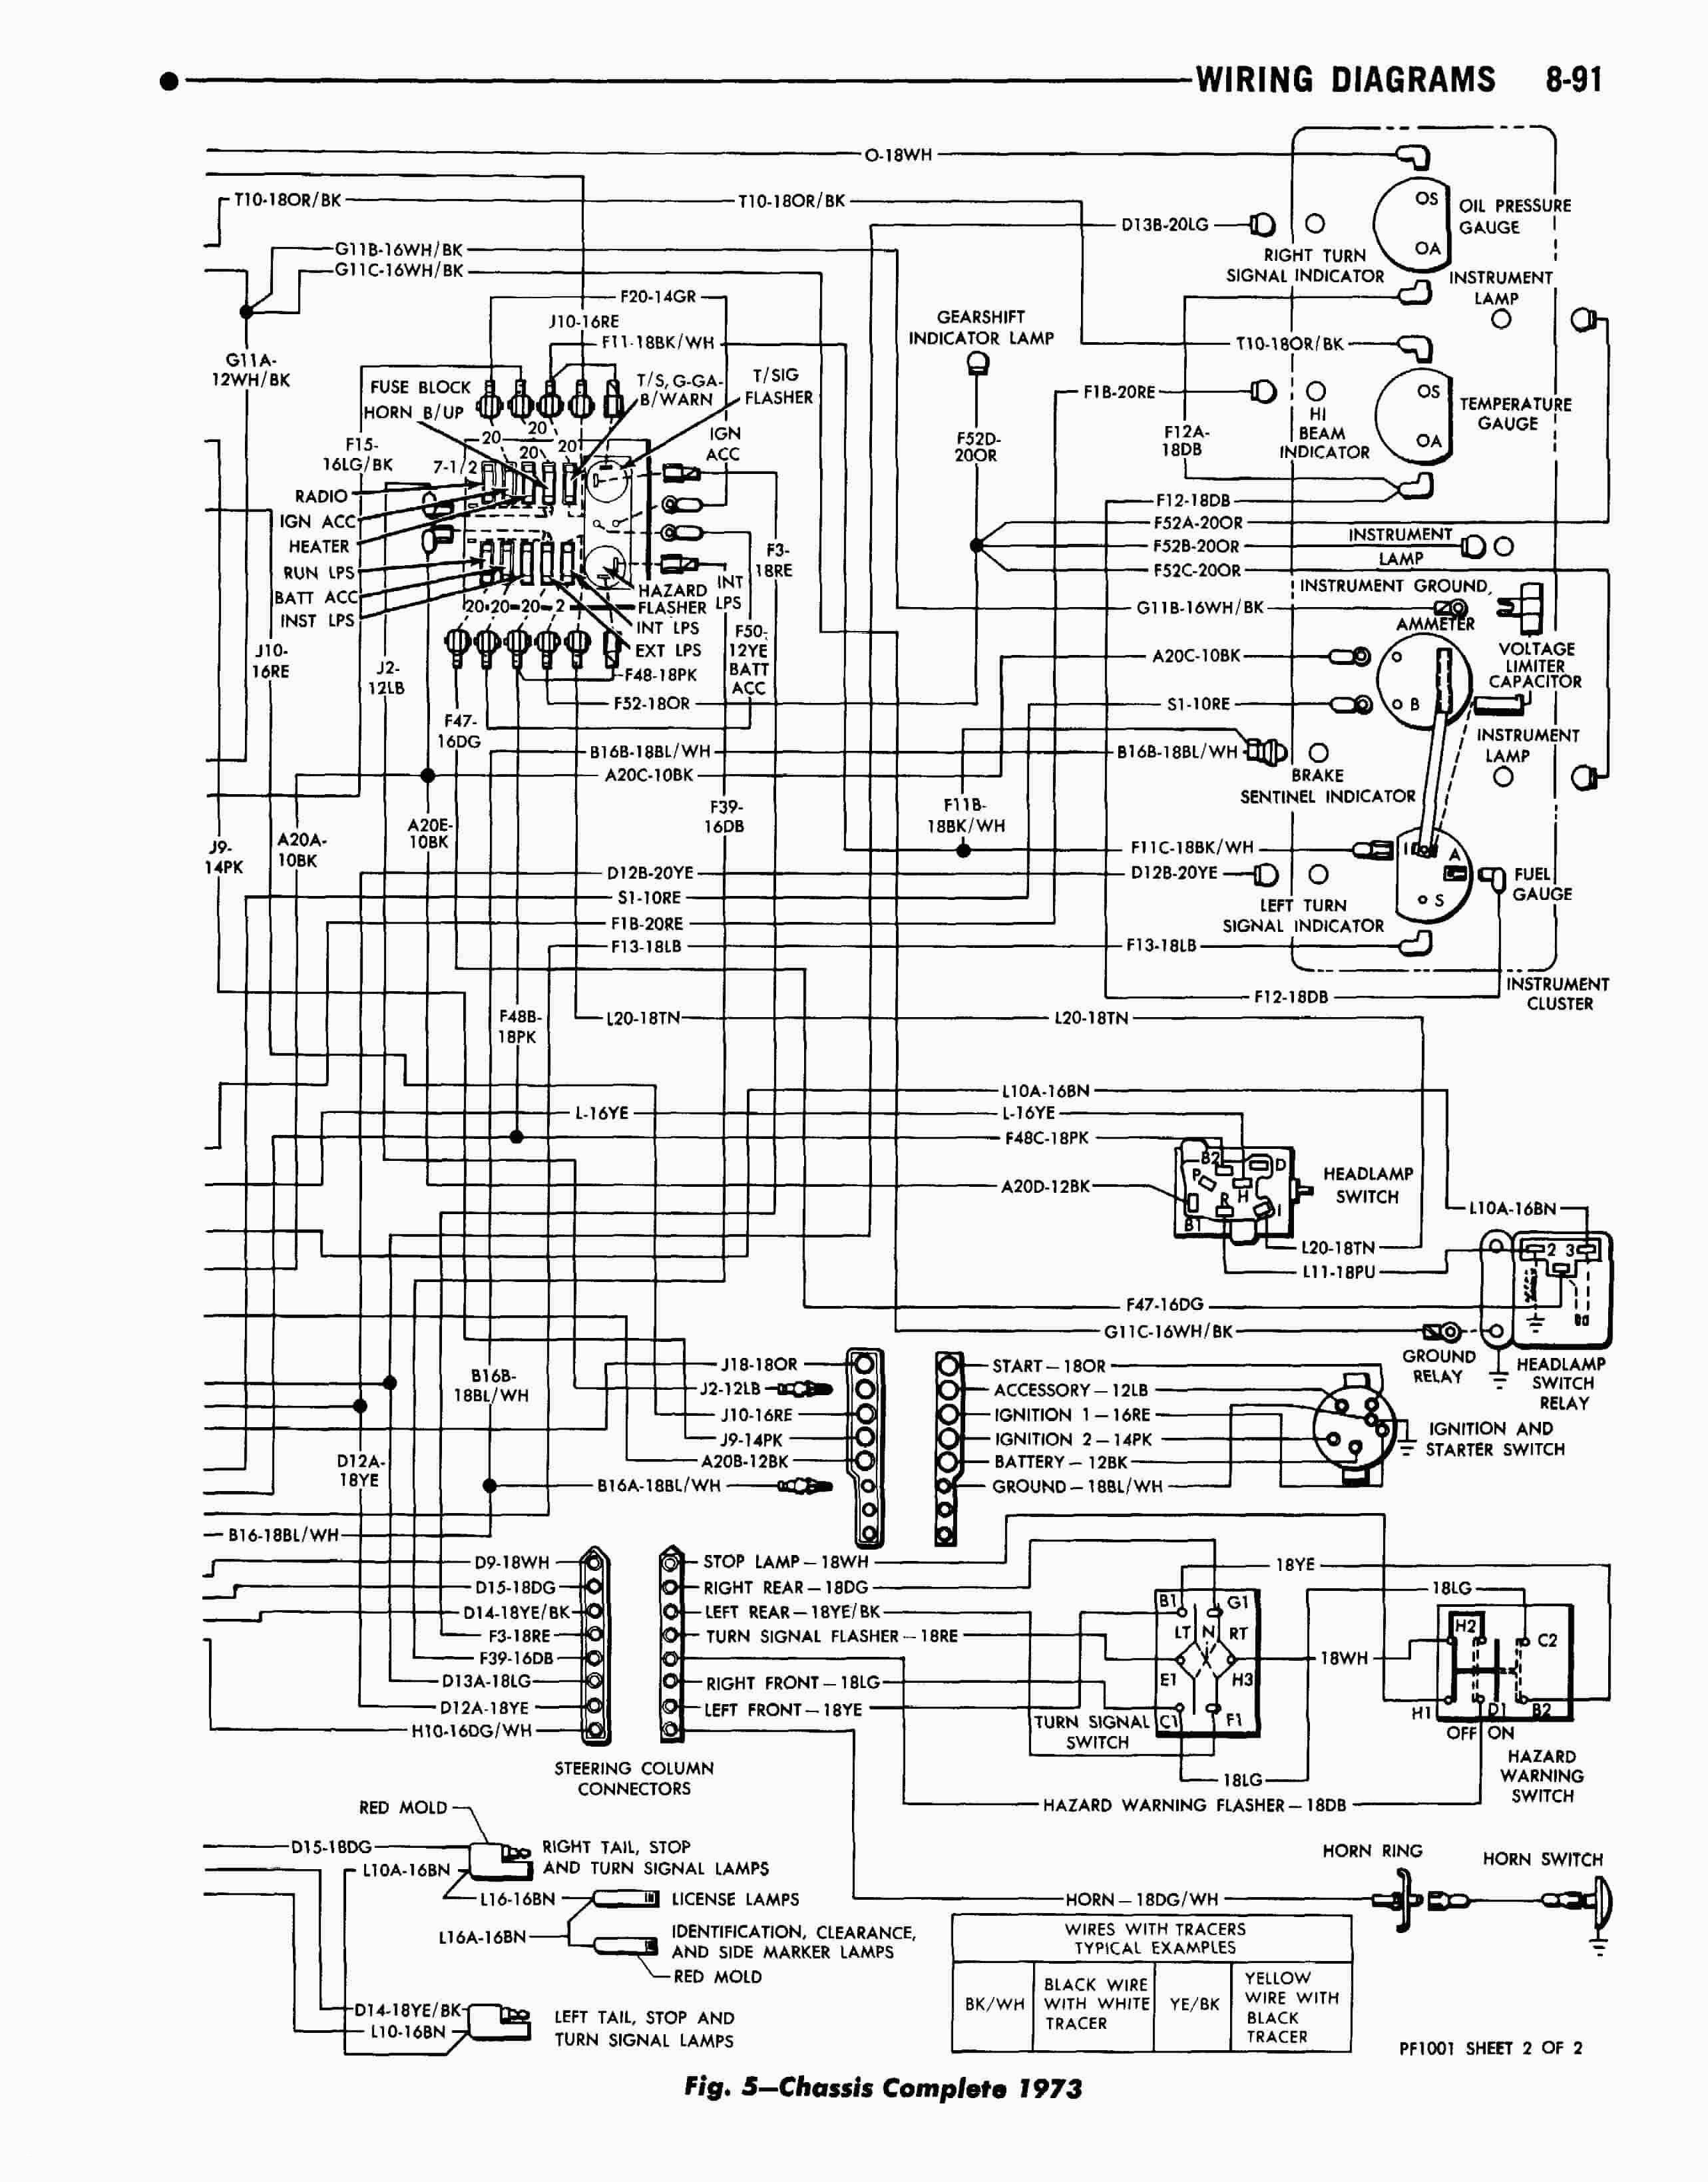 New Bmw F20 Audio Wiring Diagram Diagramspros Website Diagram Motorhome Trailer Wiring Diagram